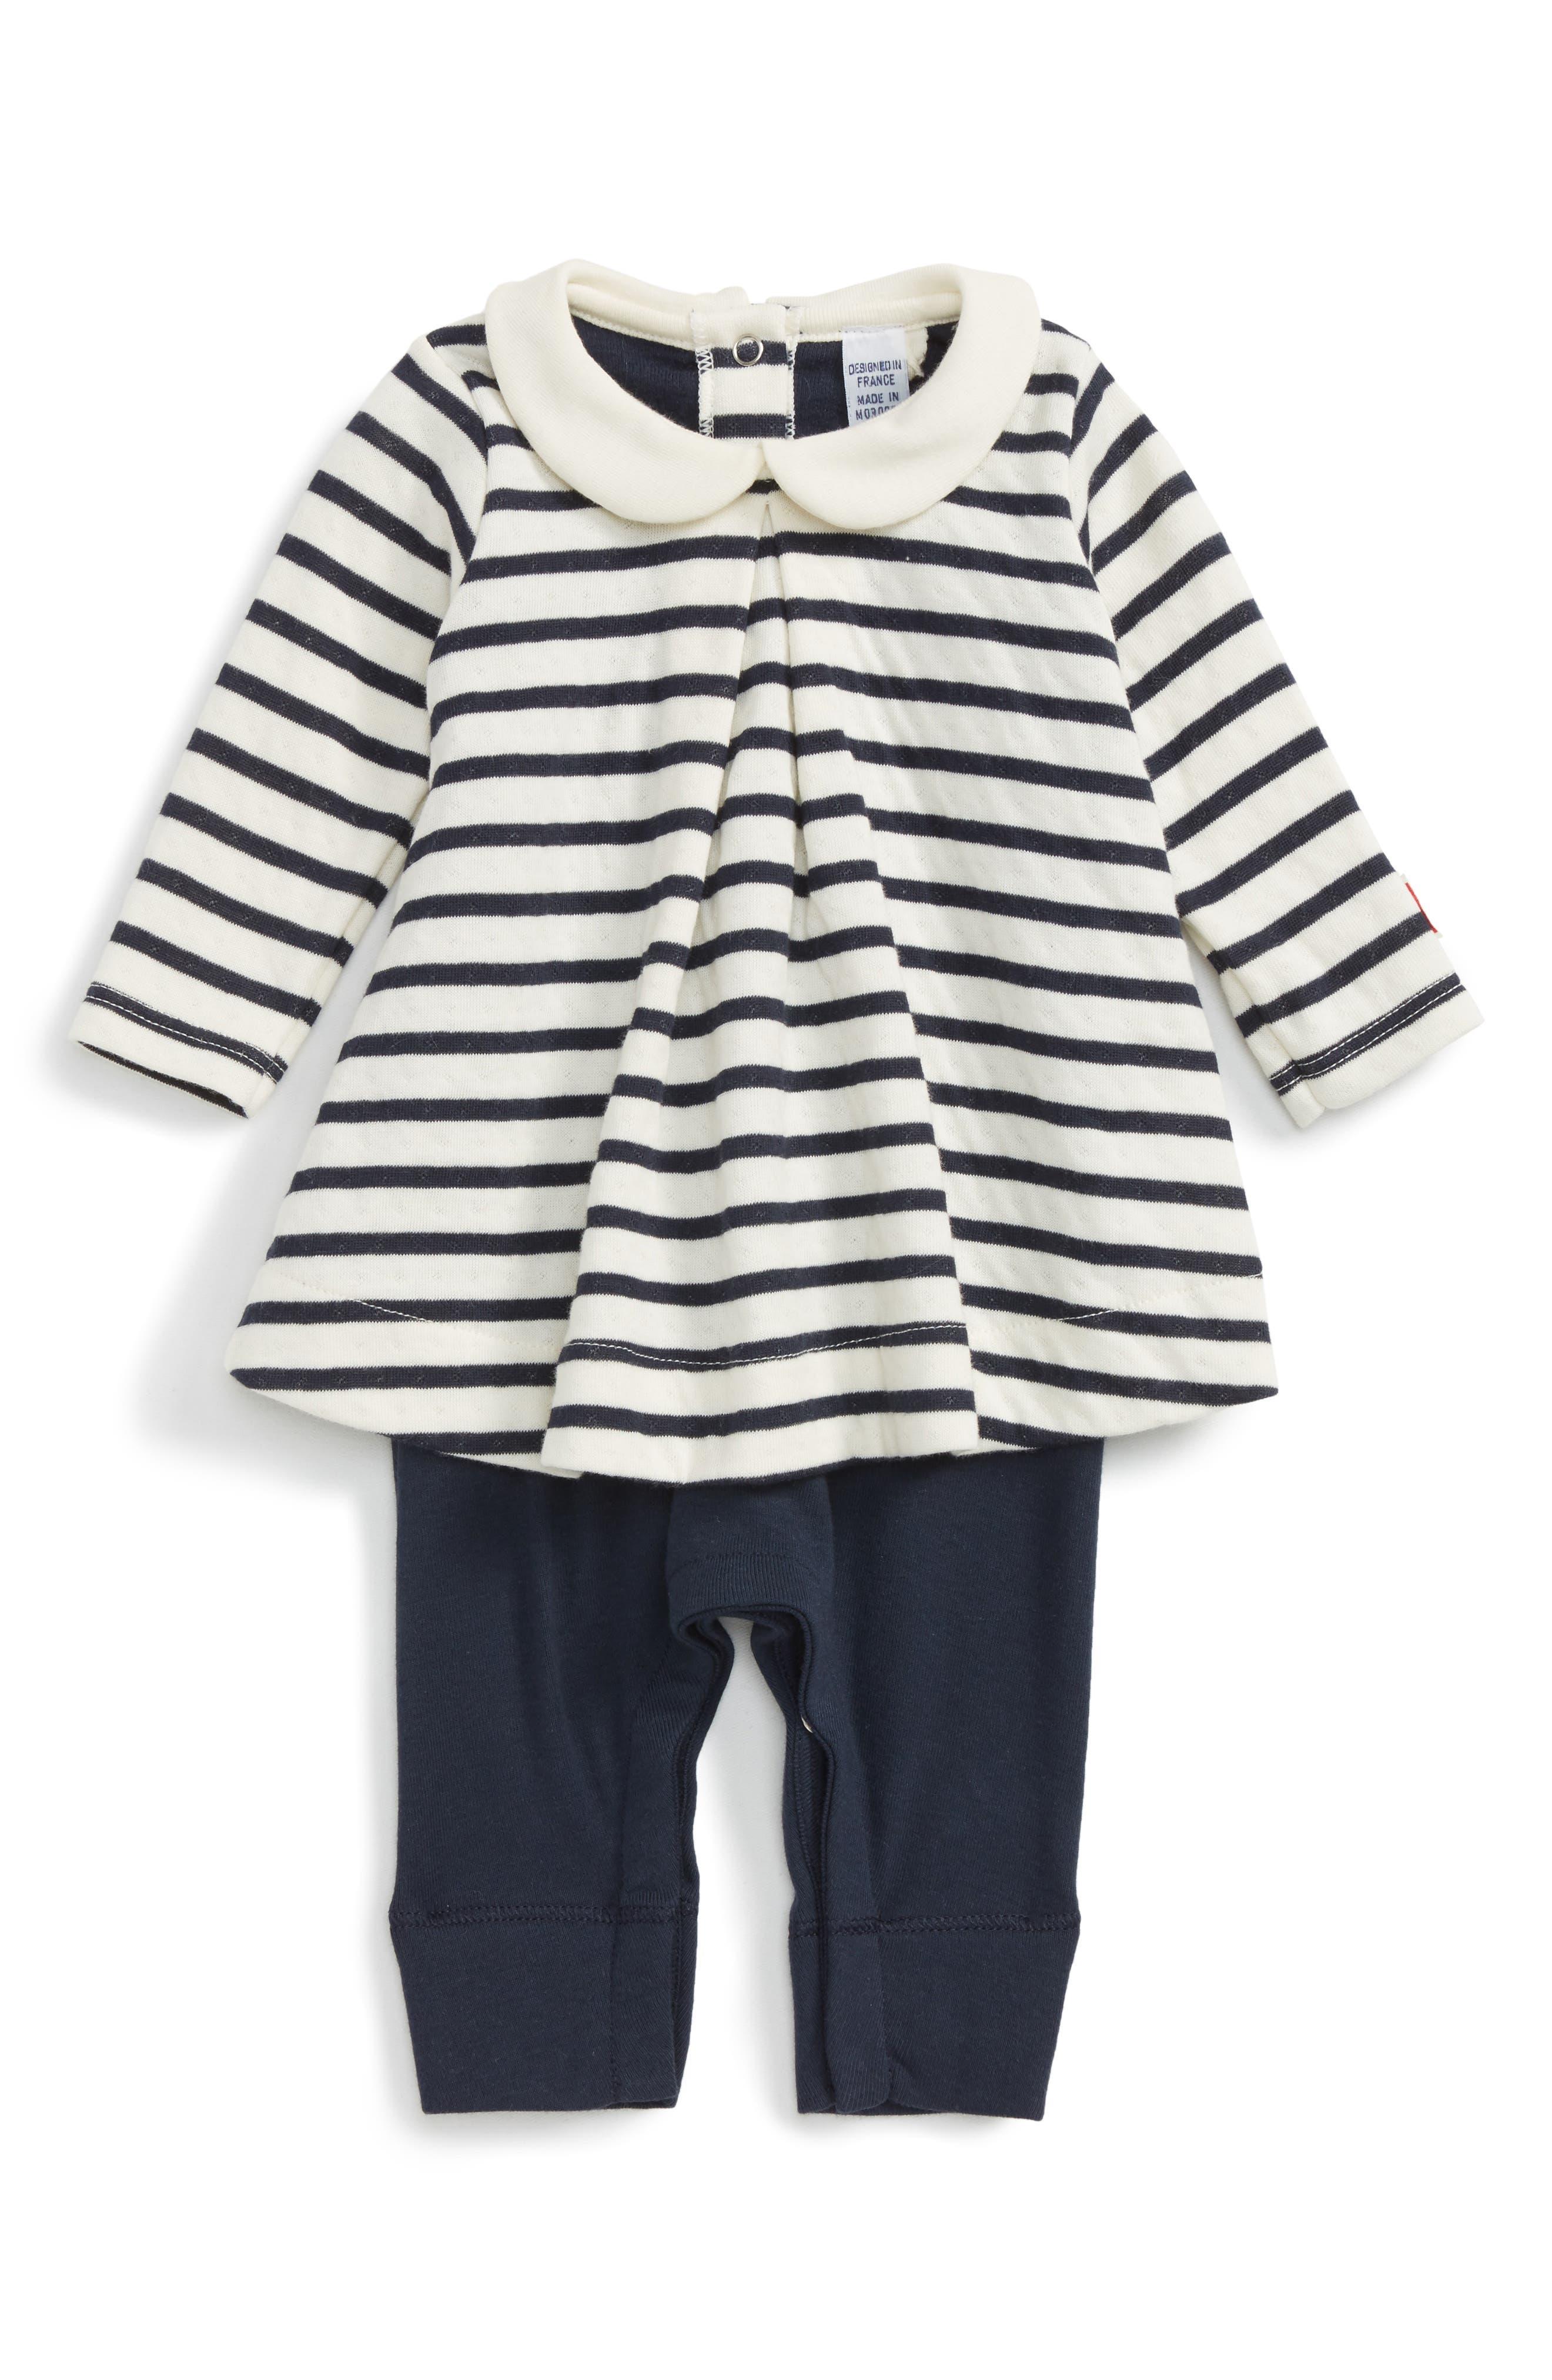 Alternate Image 1 Selected - Petit Bateau Stripe Romper (Baby Girls)